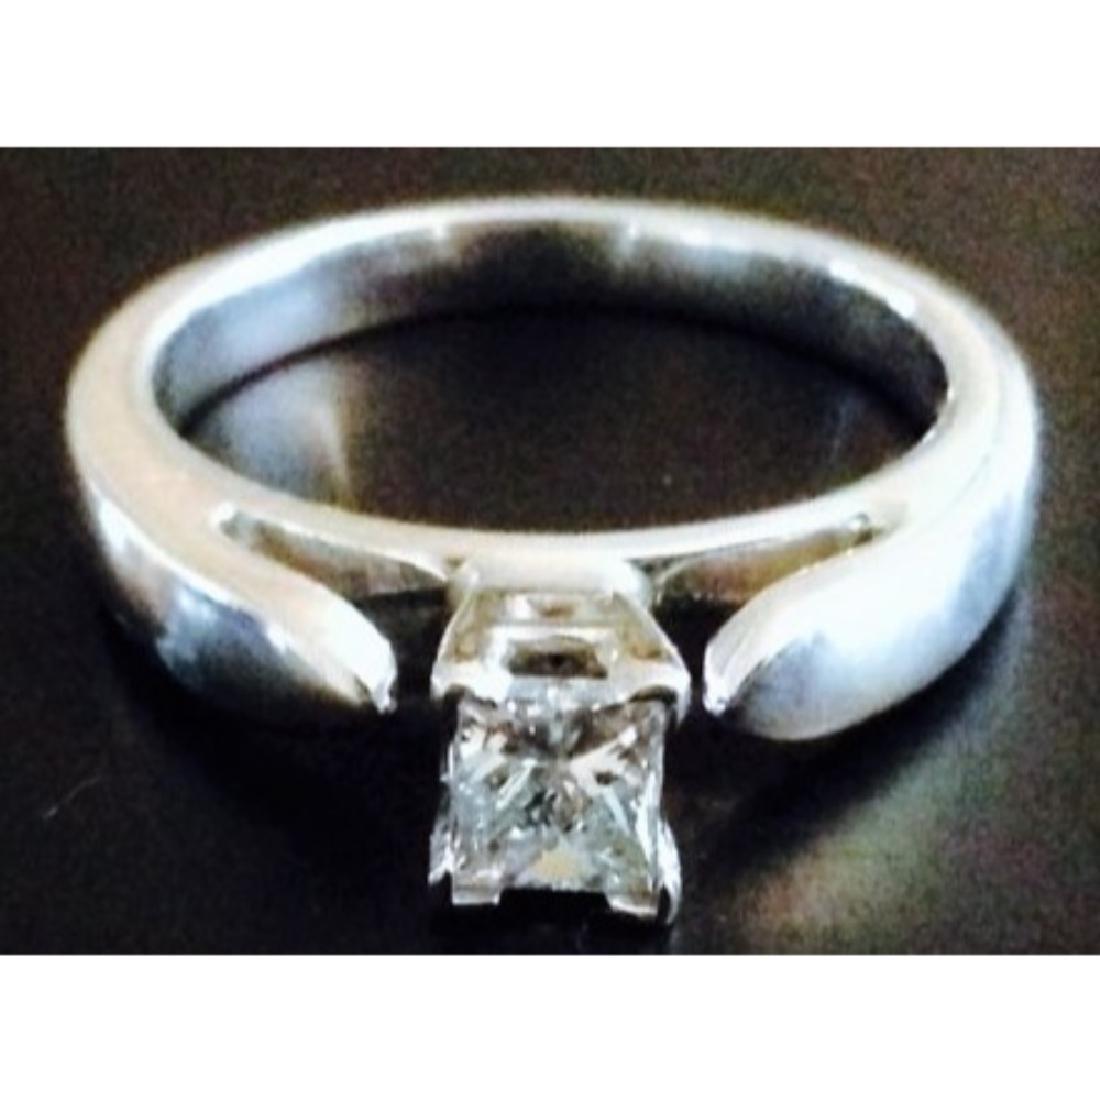 14k White Gold Princess Cut Diamond Engagement Ring - 4